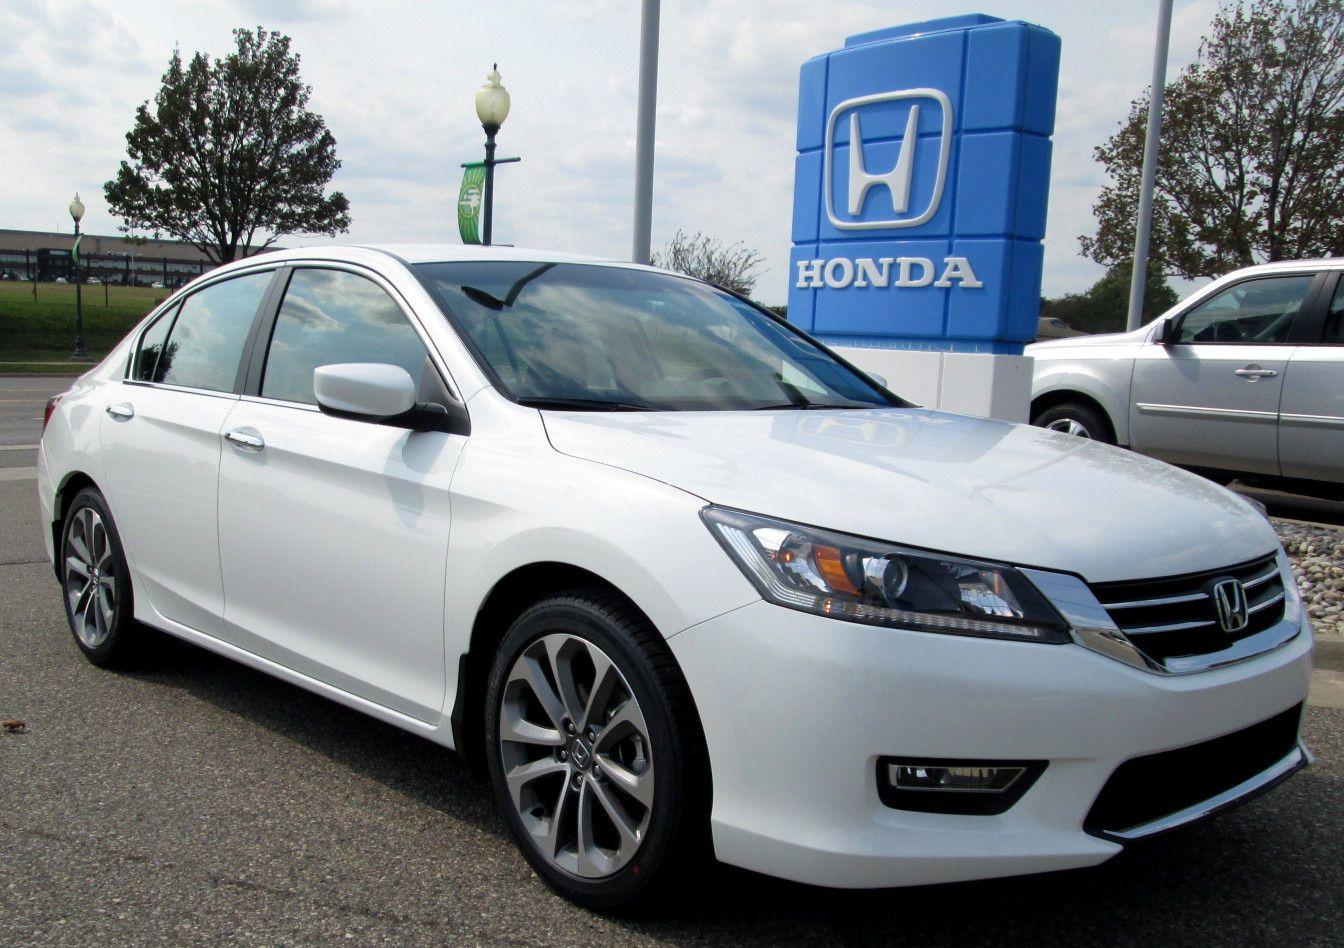 2013 White Honda Accord Touring...not an SUV but I still